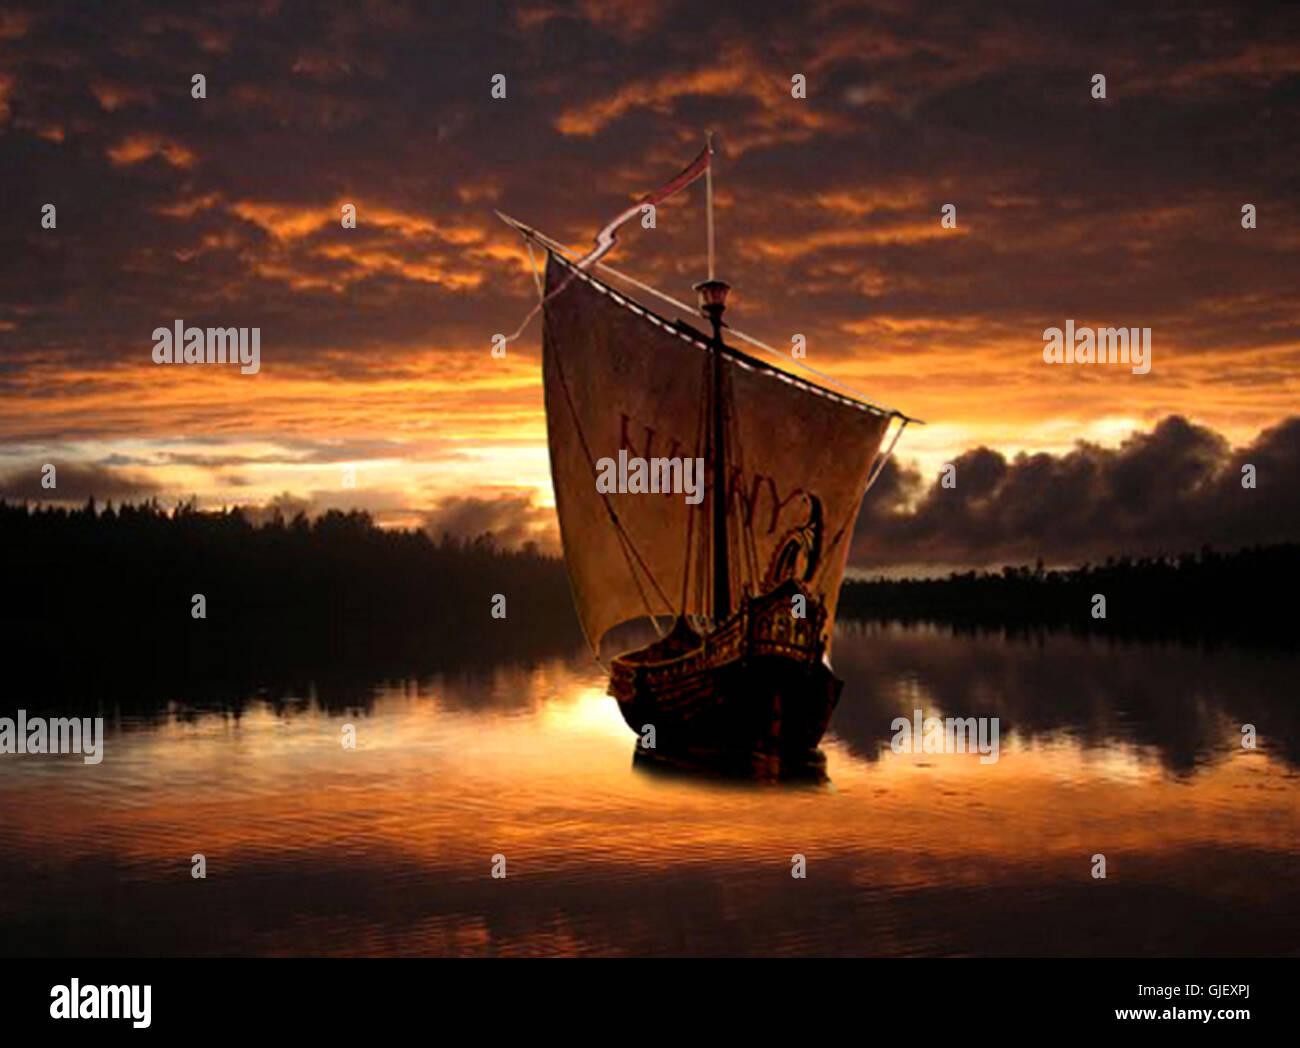 the vikings - Stock Image